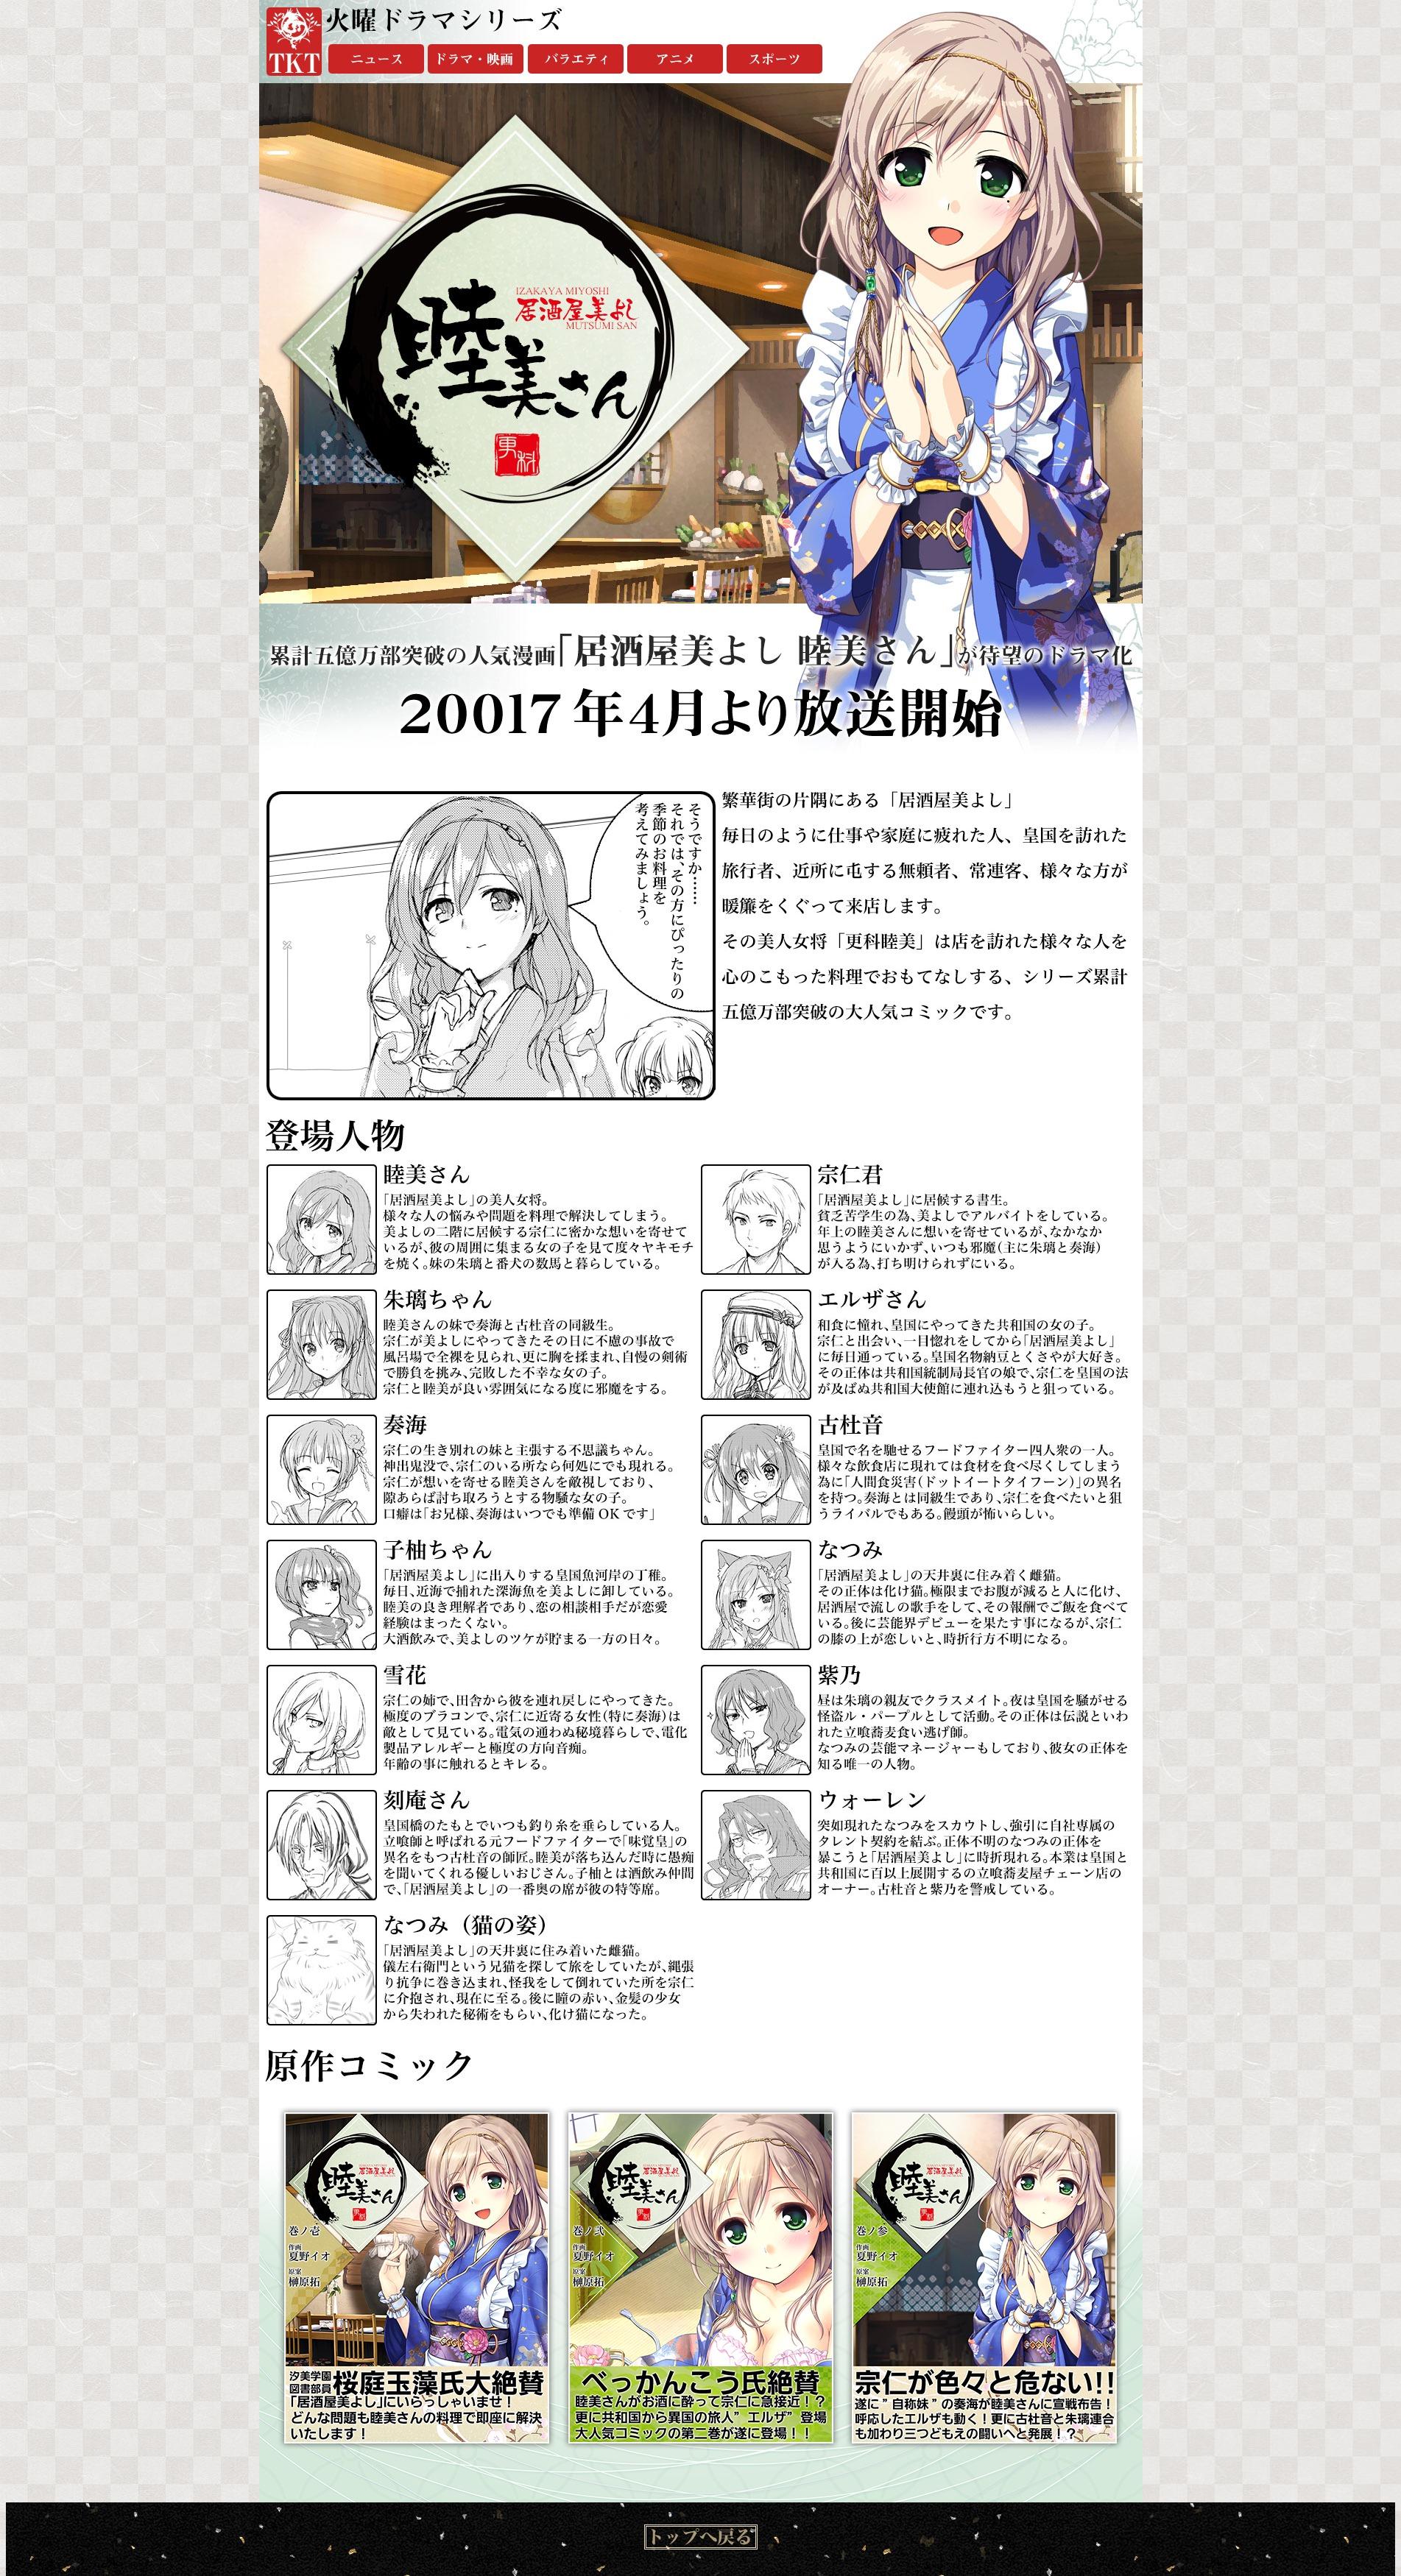 TVドラマ『居酒屋美よし 睦美さん』特設ページ